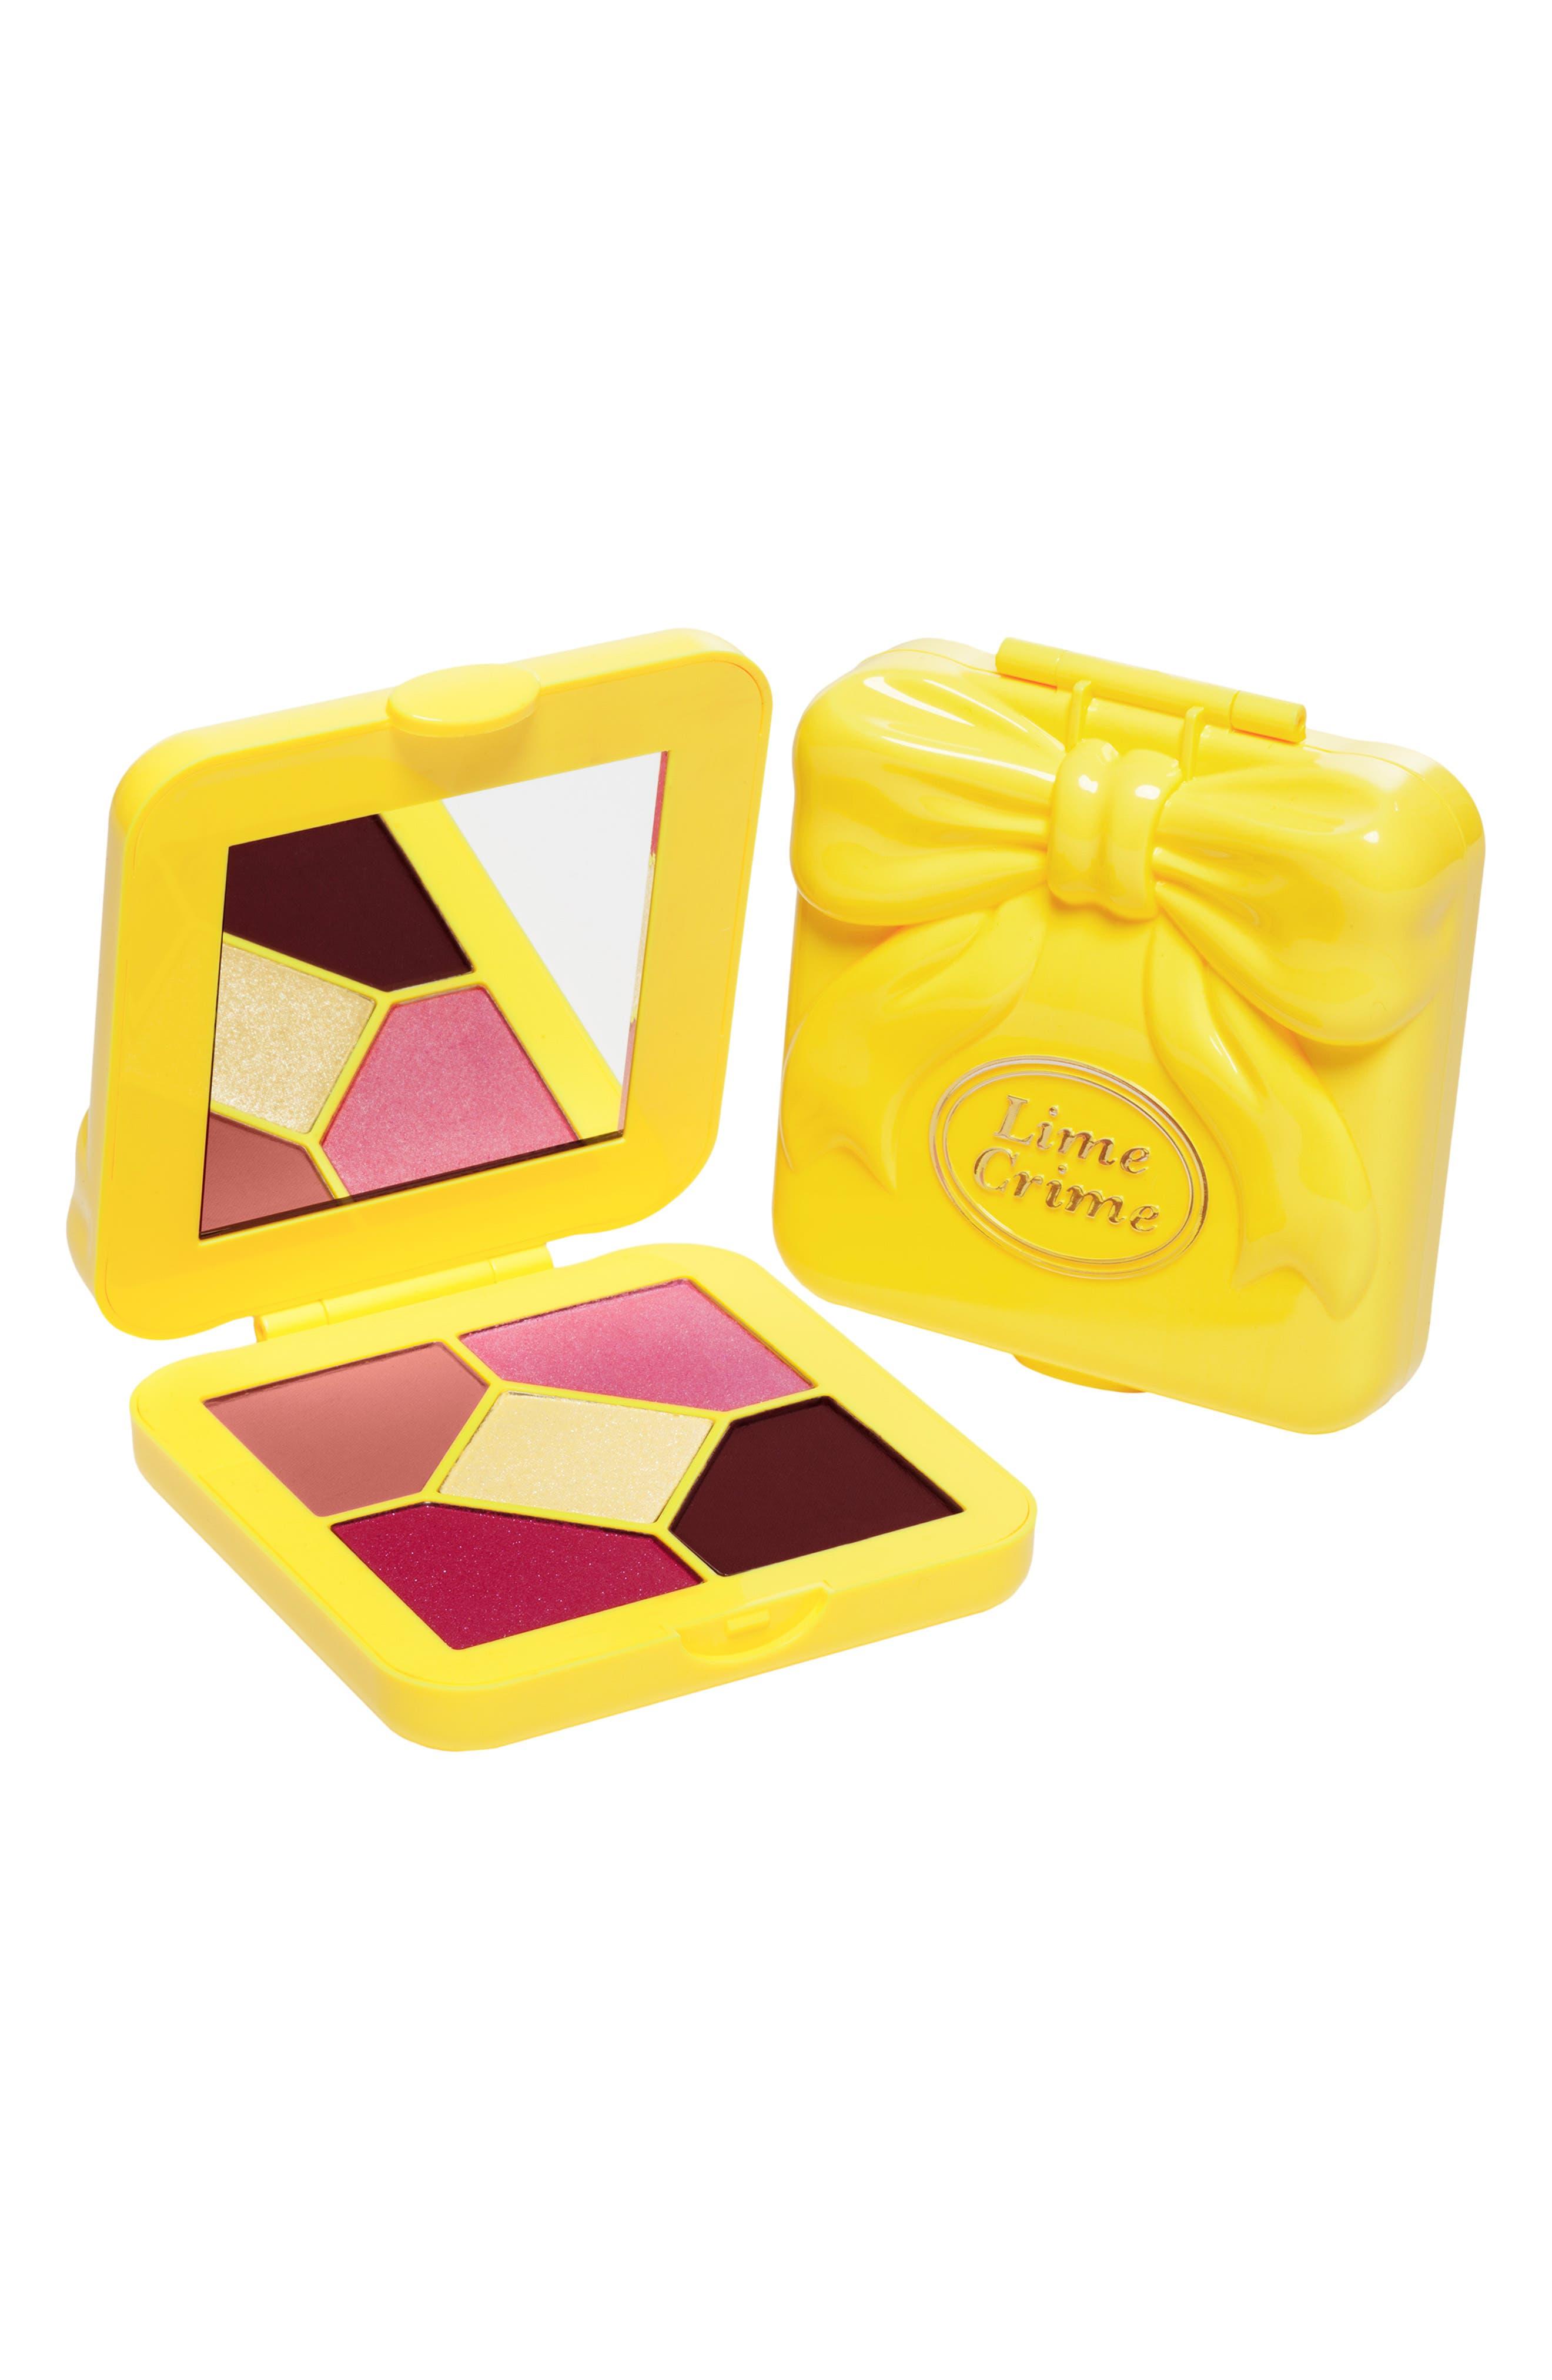 Pocket Candy Palette,                             Alternate thumbnail 2, color,                             PINK LEMONADE